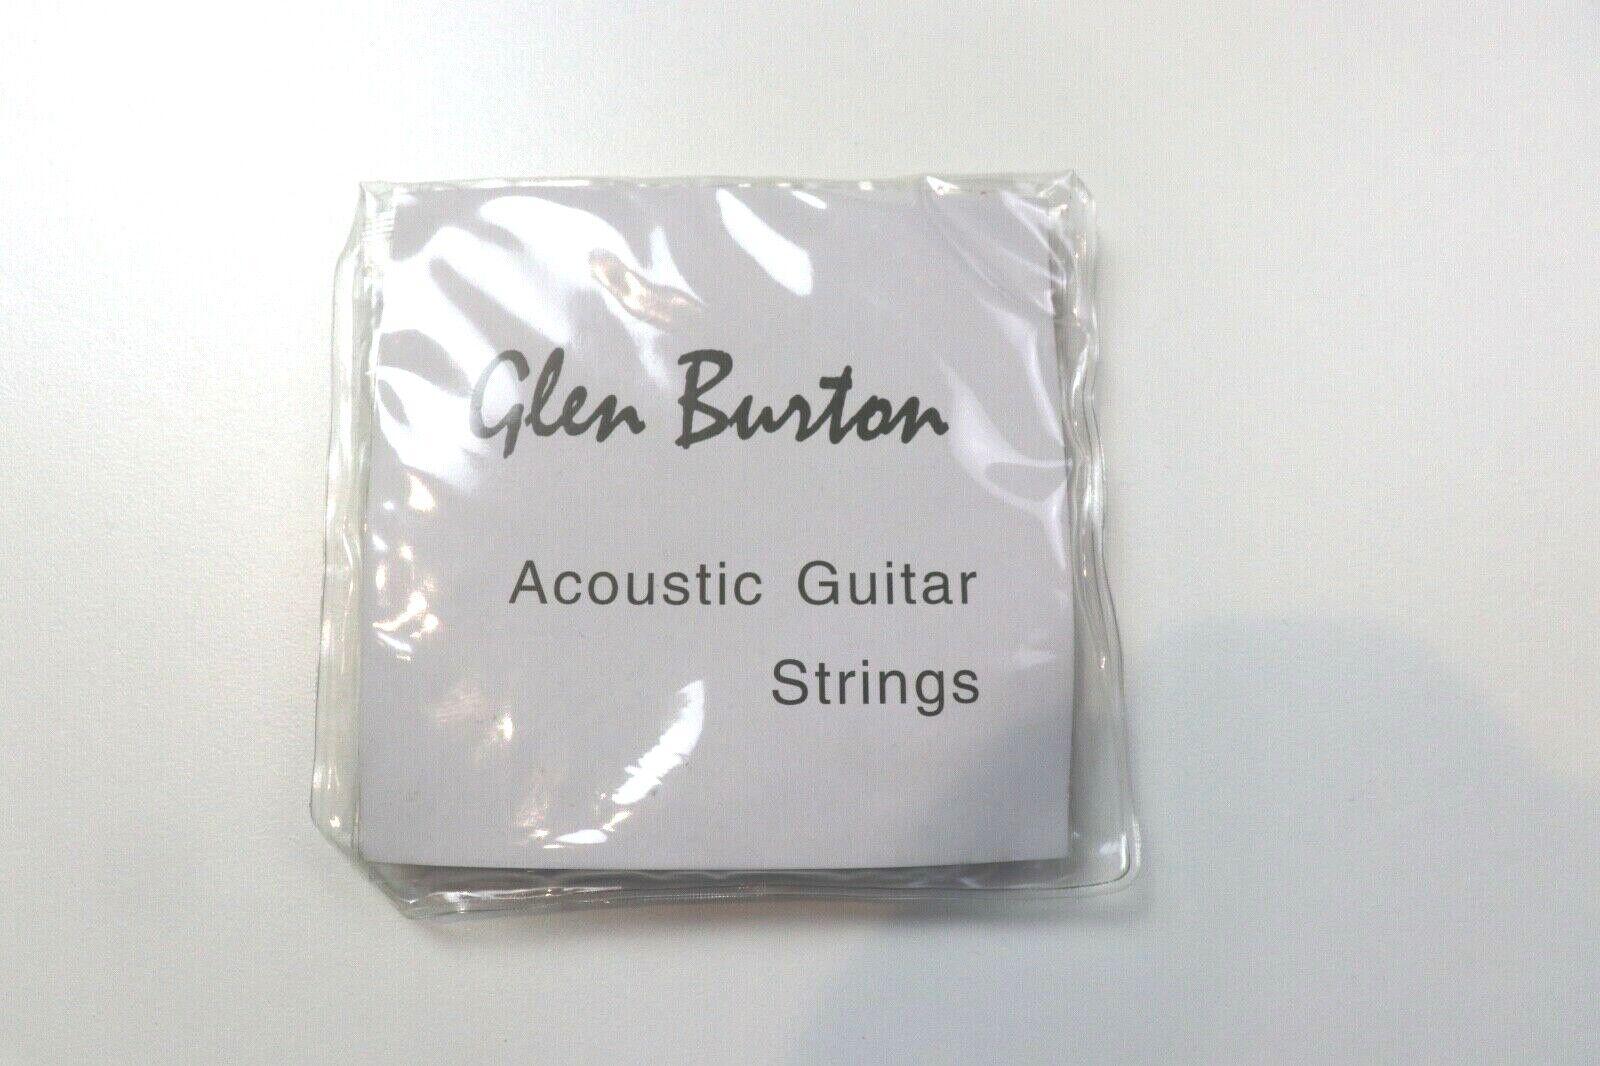 Glen Burton Acoustic electric cutaway guitar strings